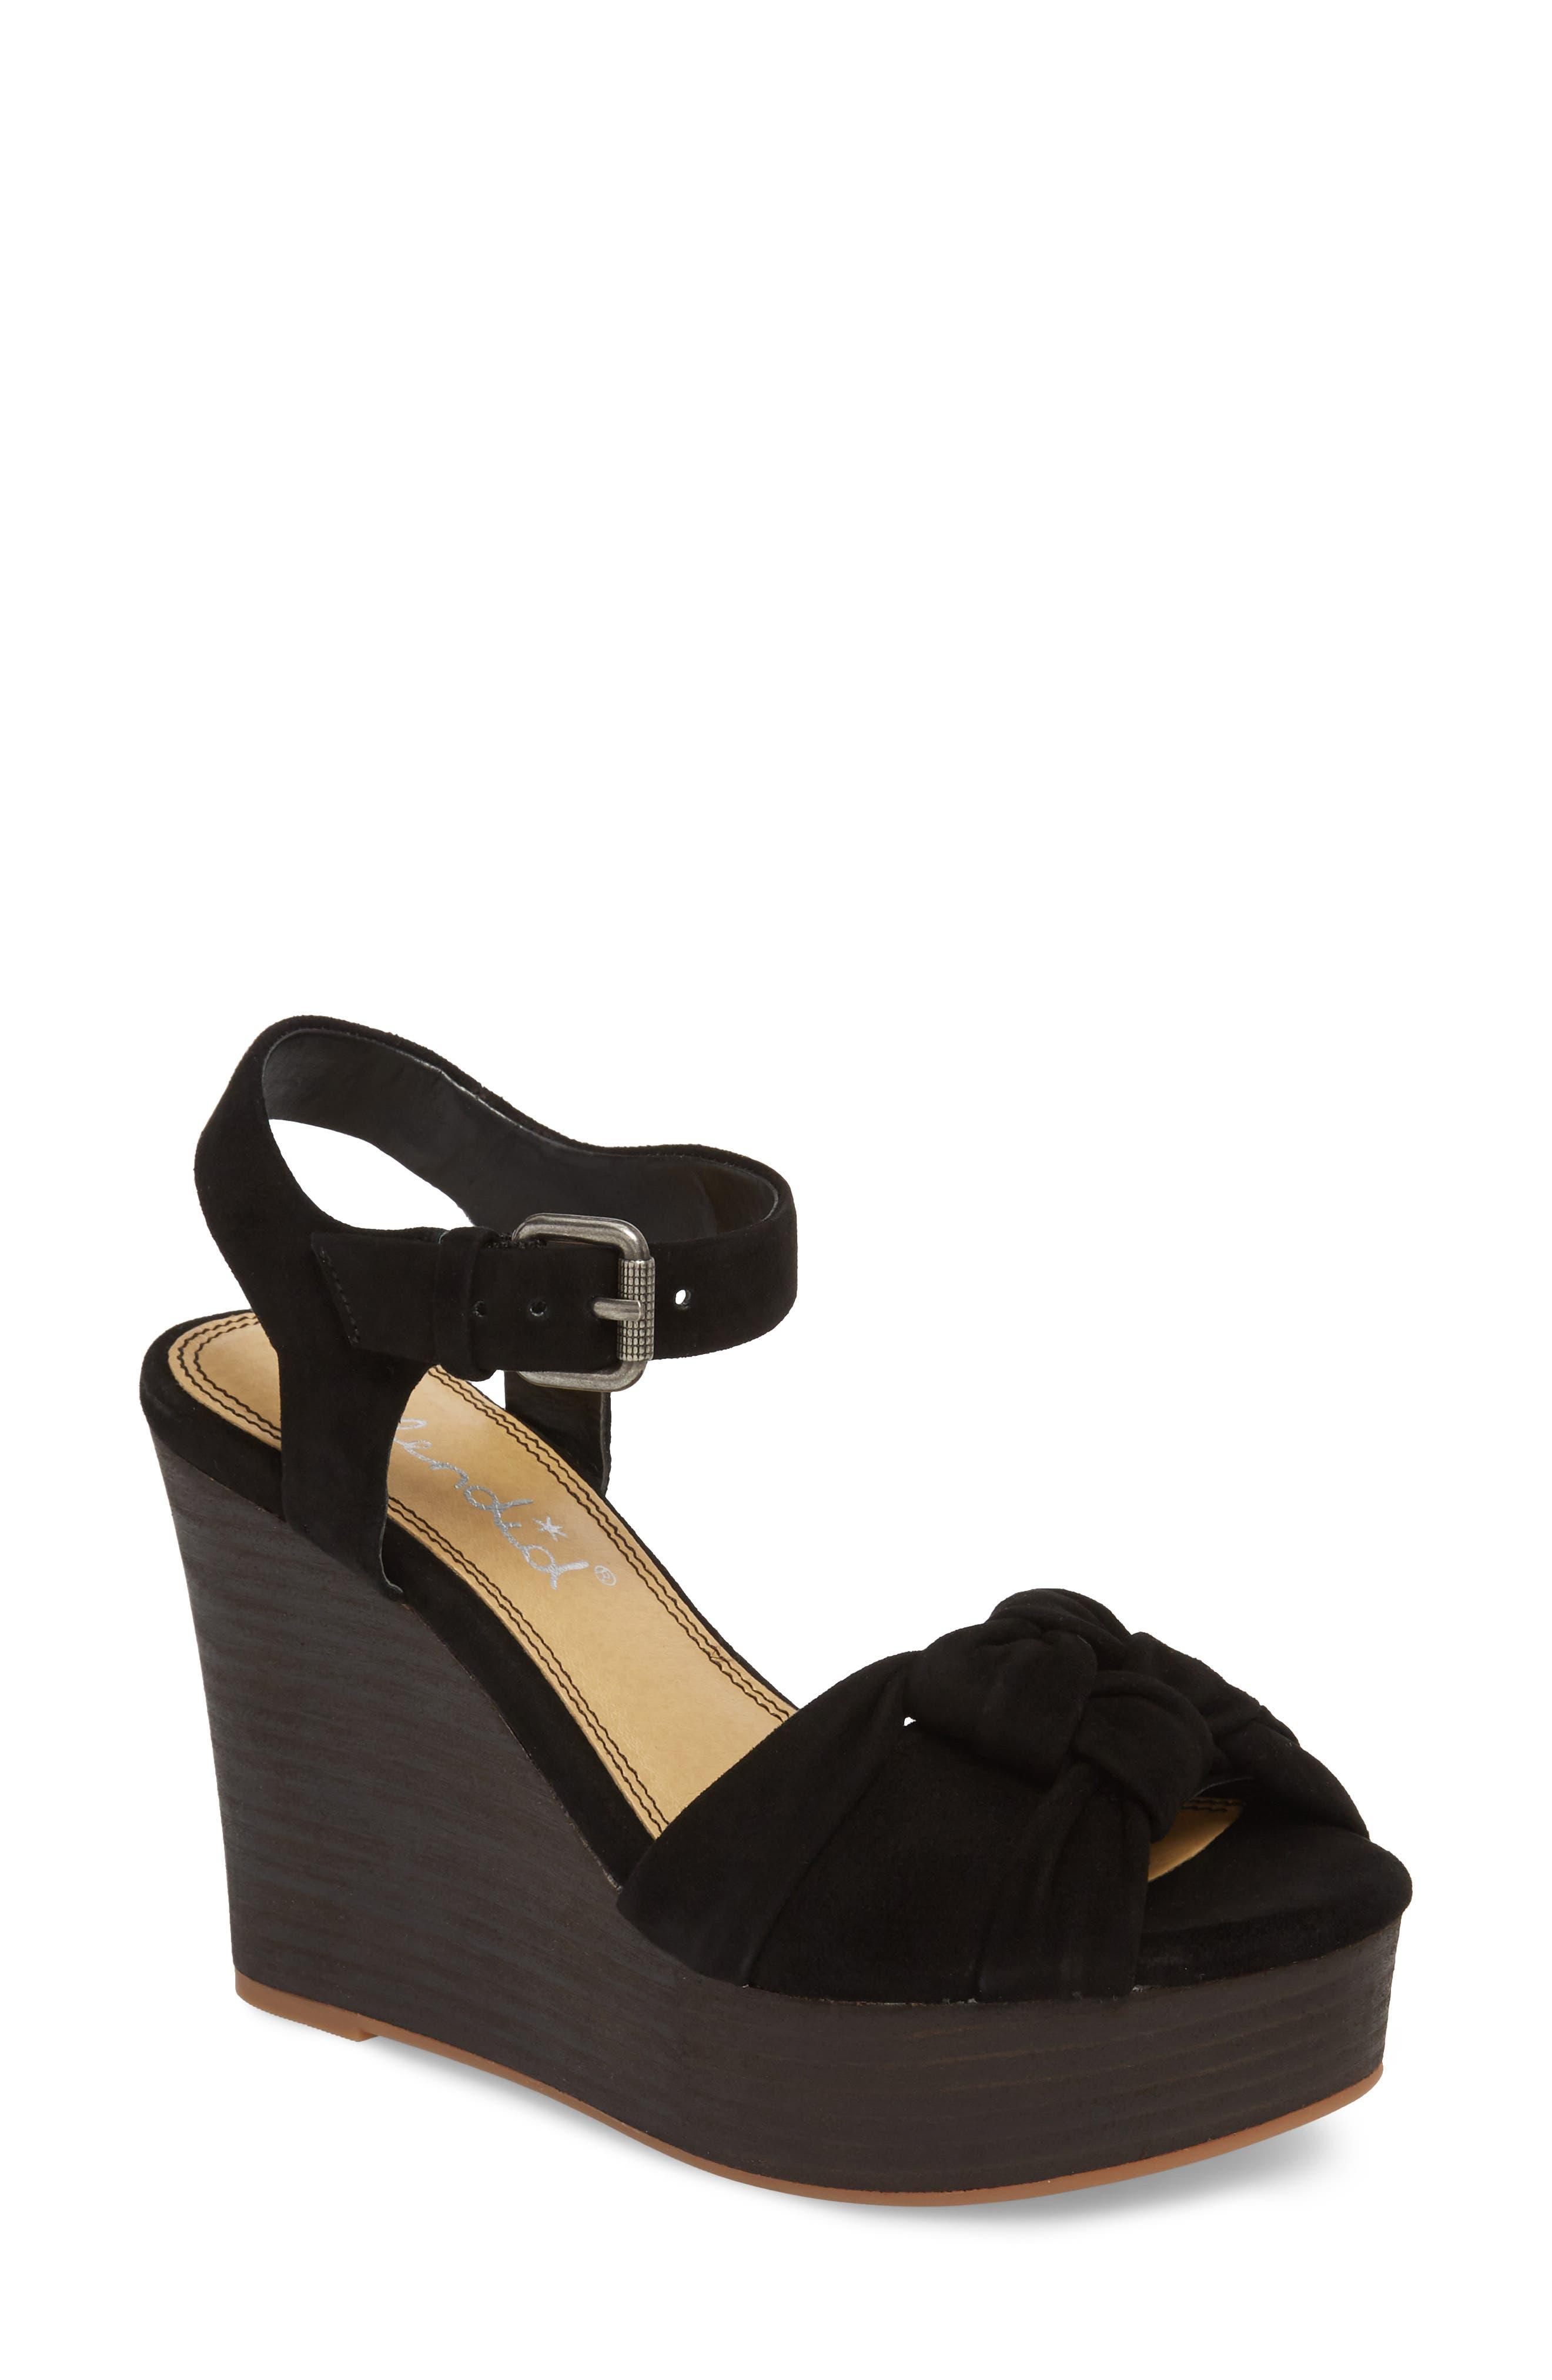 Nada Platform Wedge Sandal,                             Main thumbnail 1, color,                             BLACK SUEDE